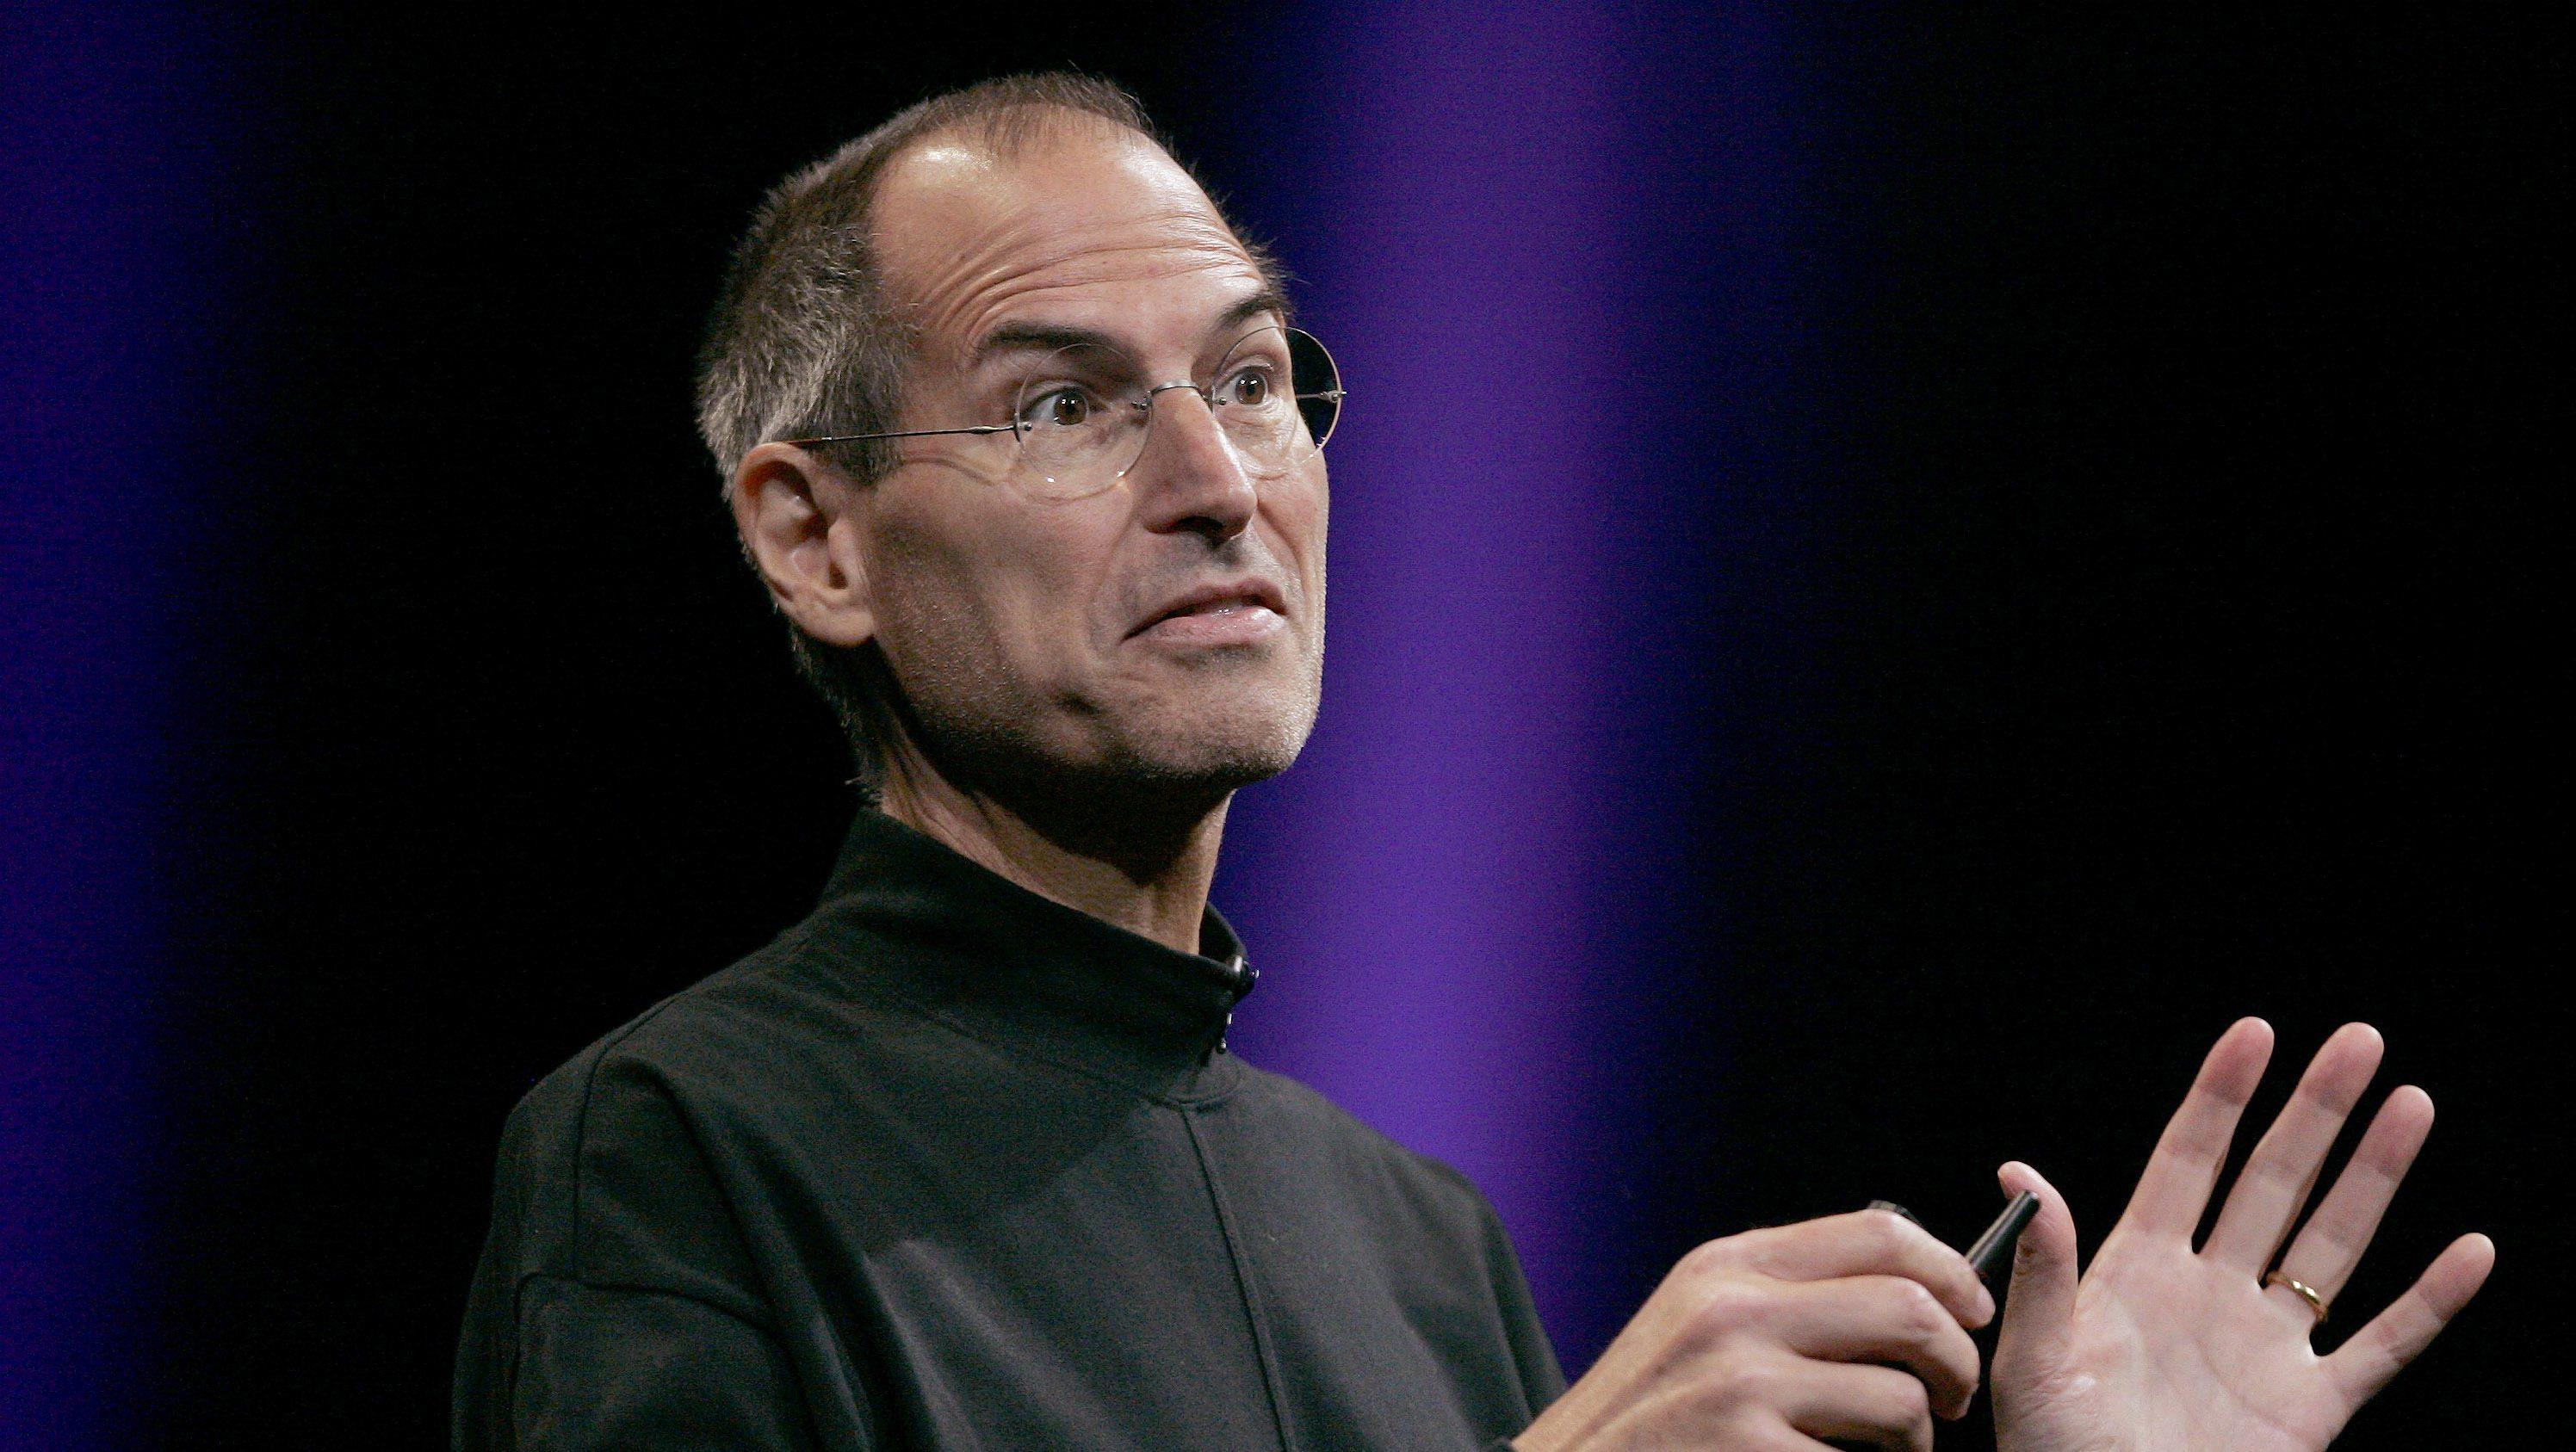 Apple CEO Steve Jobs gave brutal but effective reviews